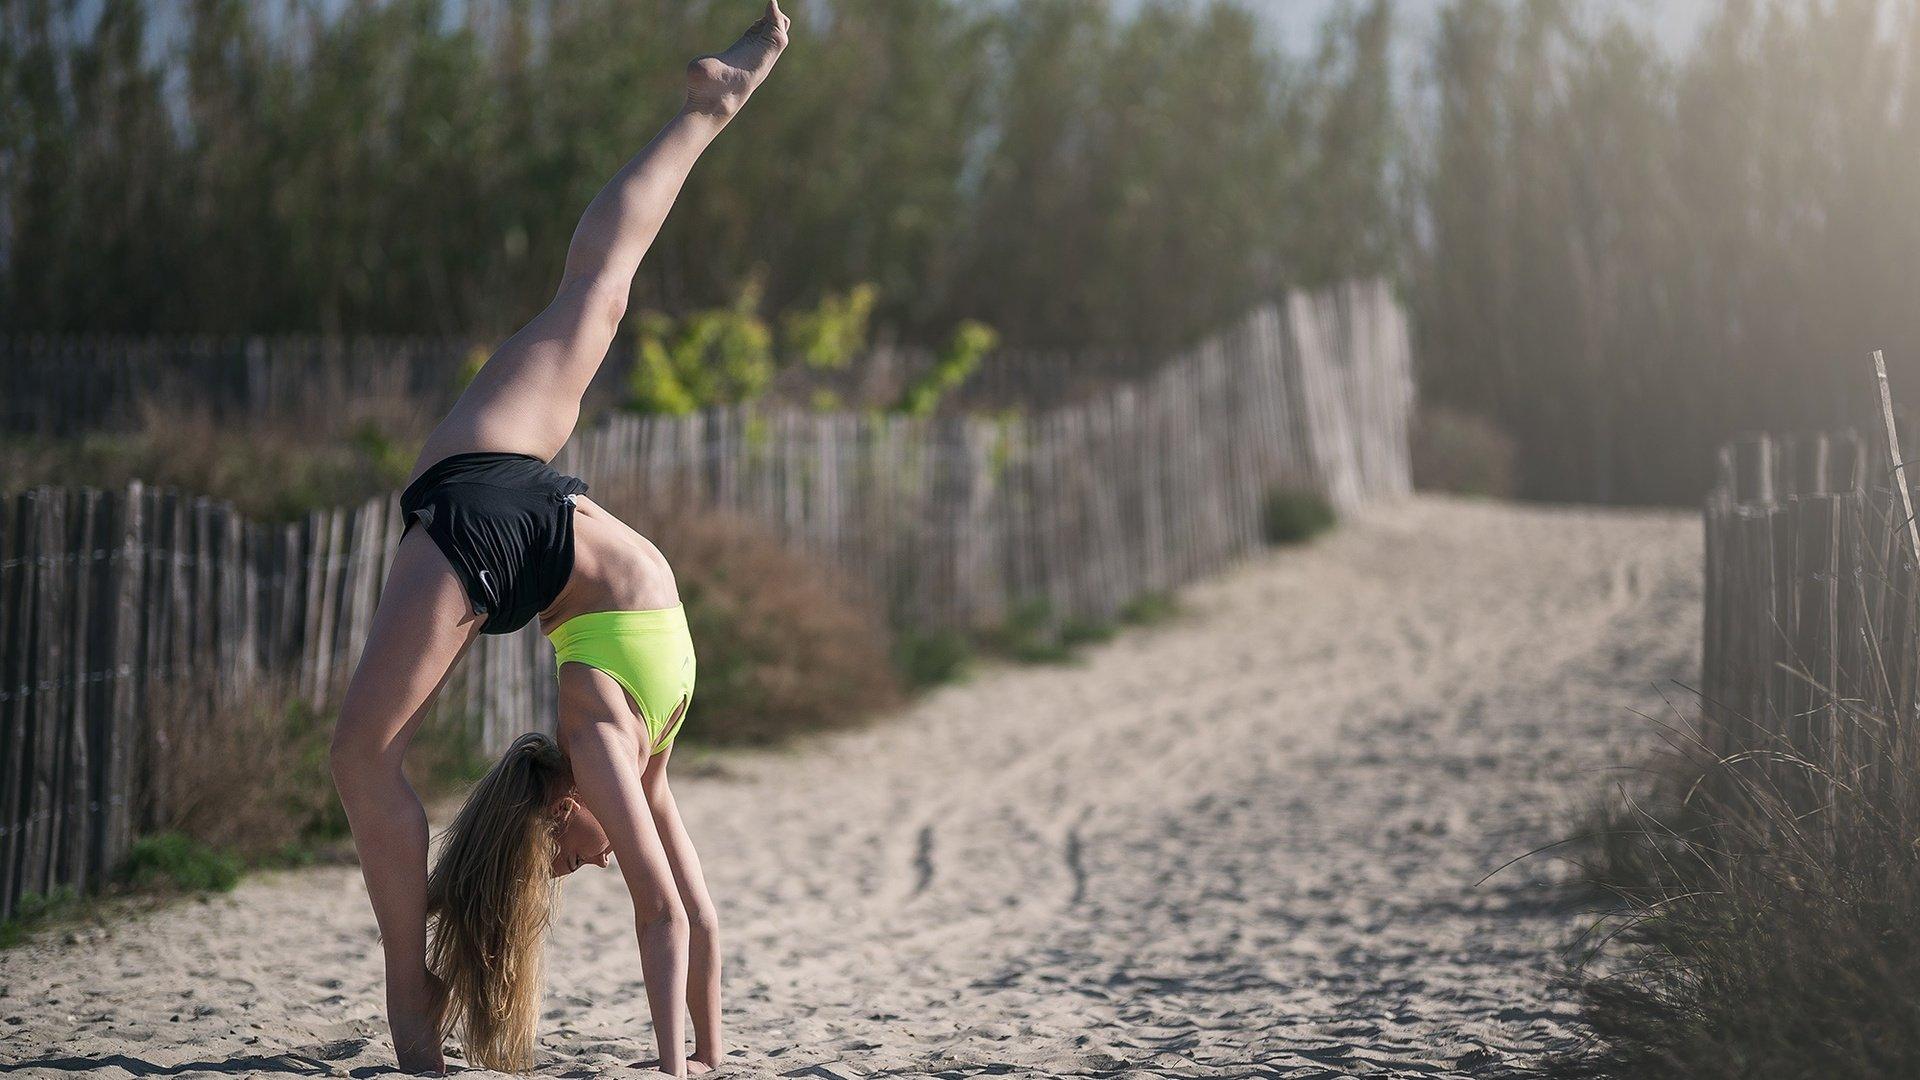 круто, гимнастки на природе фото фото девочек лесбиянок